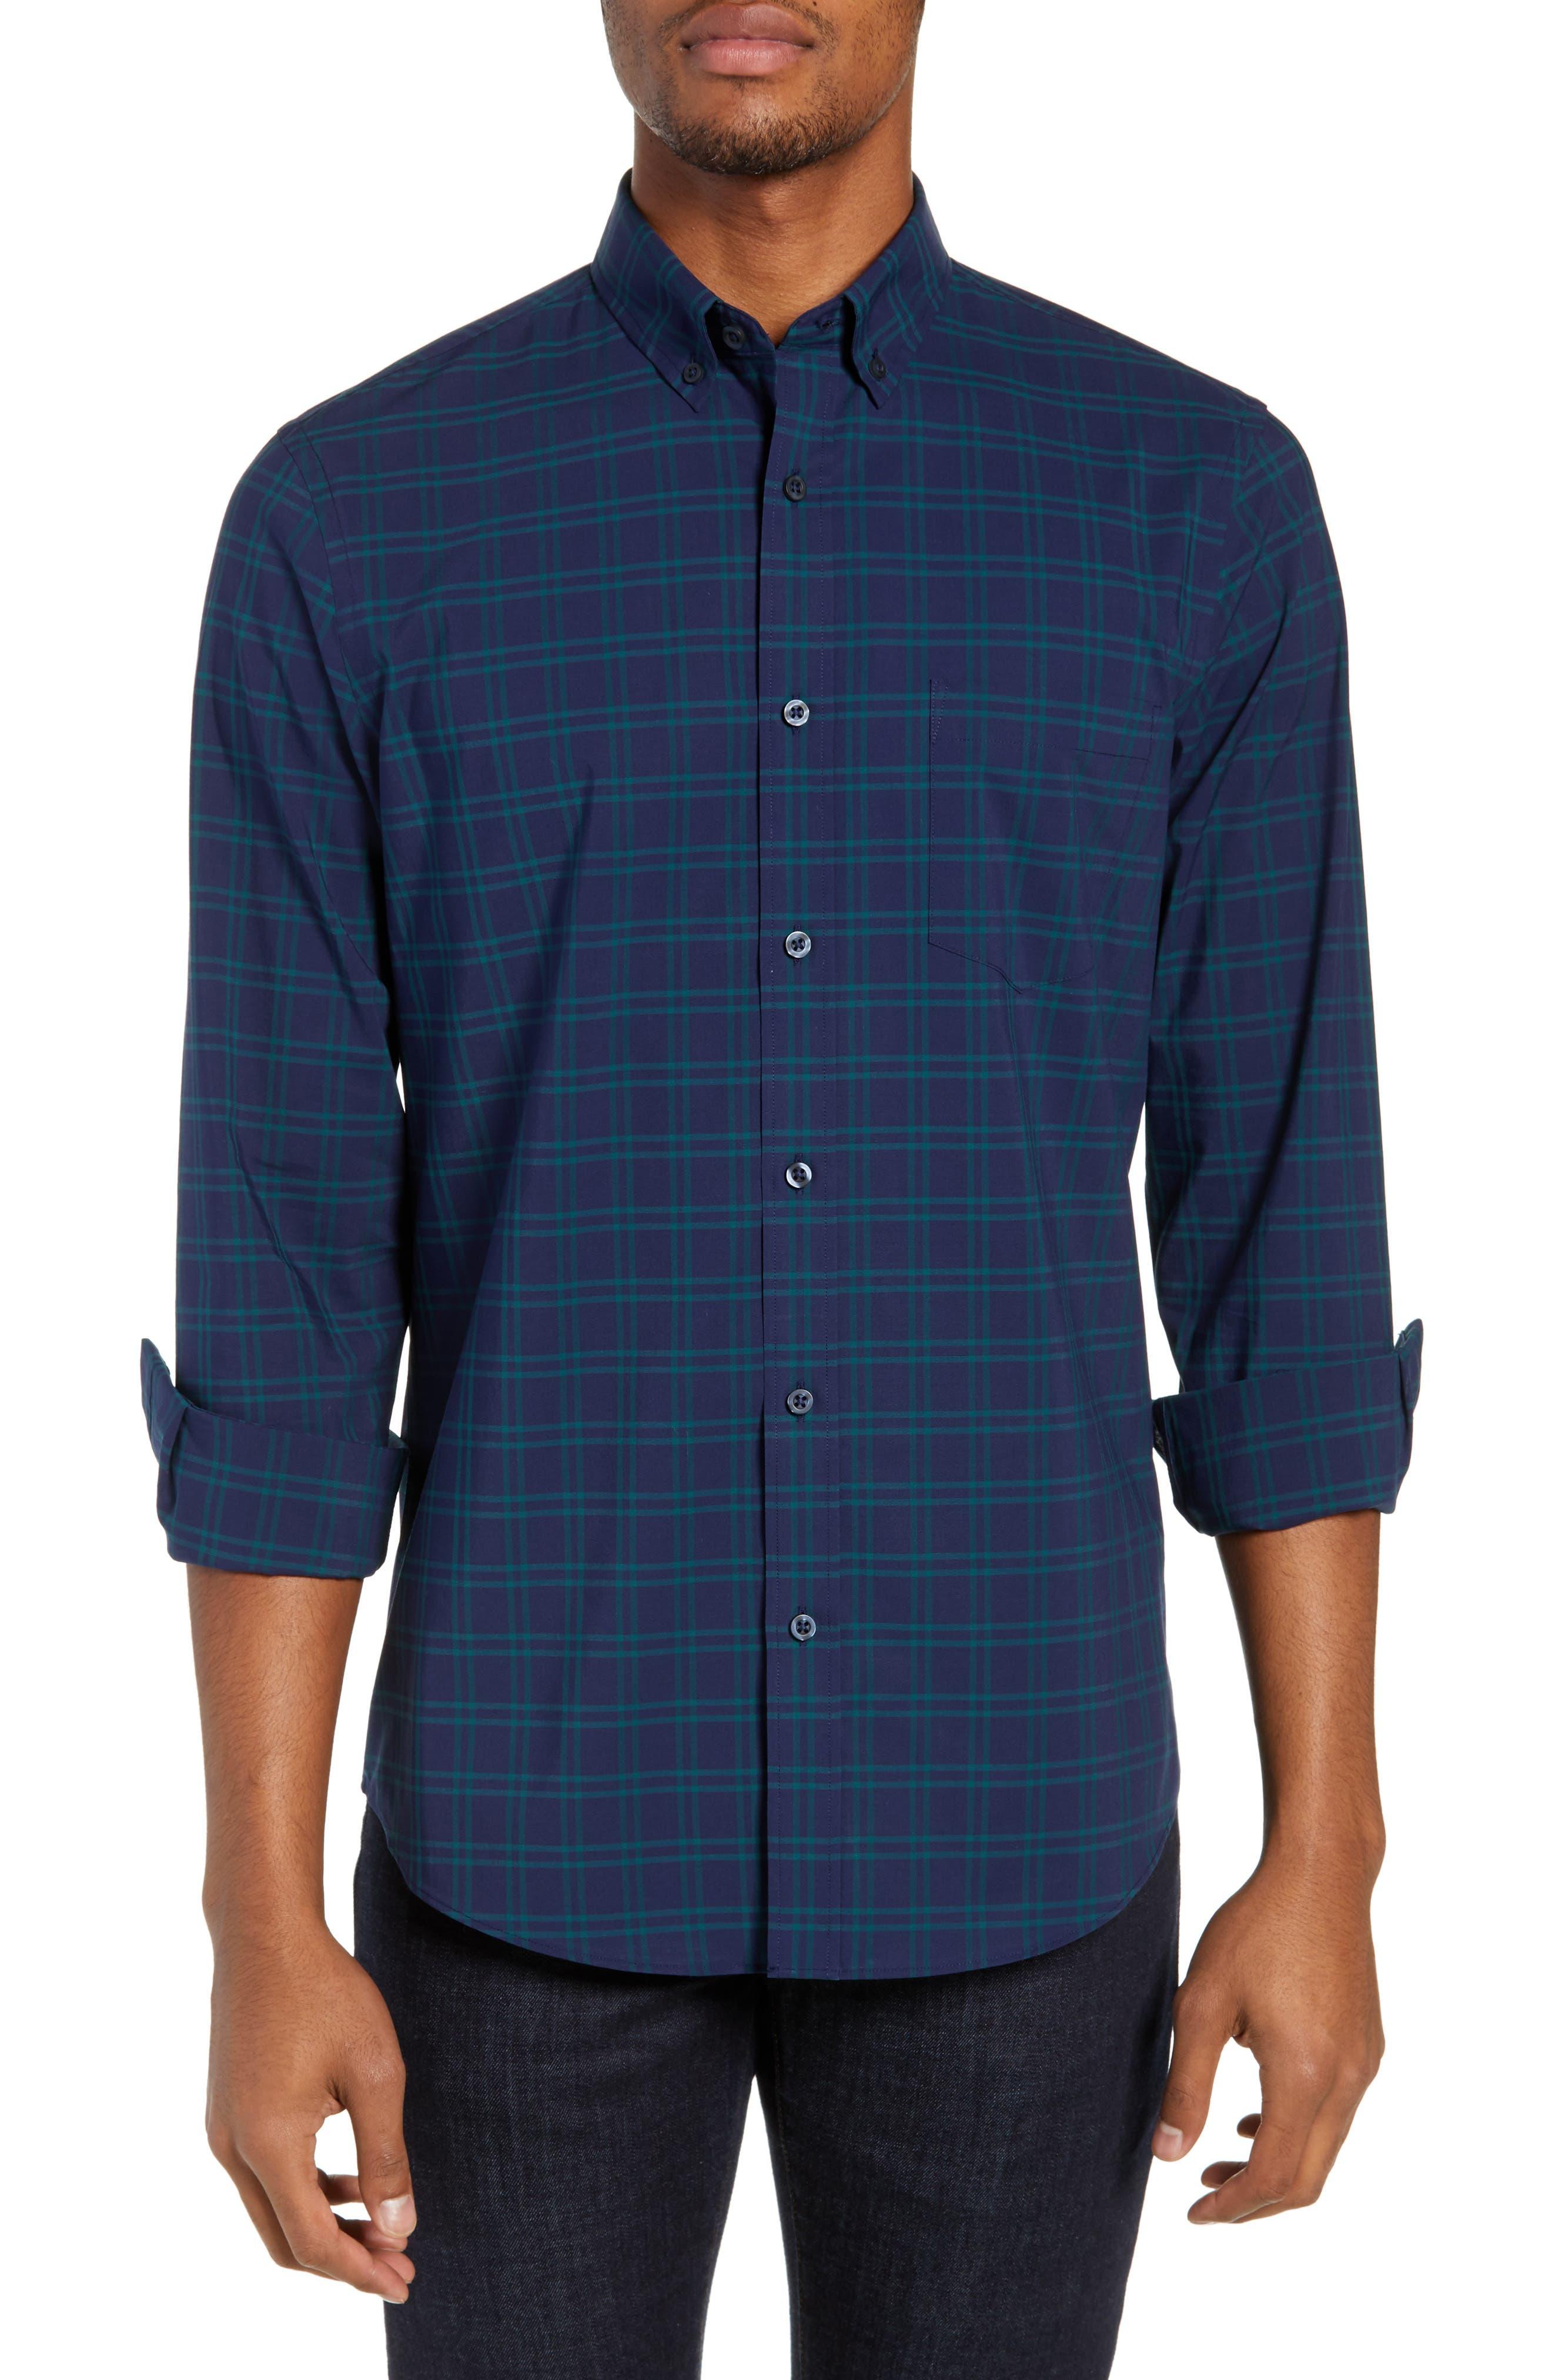 NORDSTROM MEN'S SHOP,                             Tech-Smart Slim Fit Check Sport Shirt,                             Main thumbnail 1, color,                             NAVY IRIS TEAL WINDOWPANE